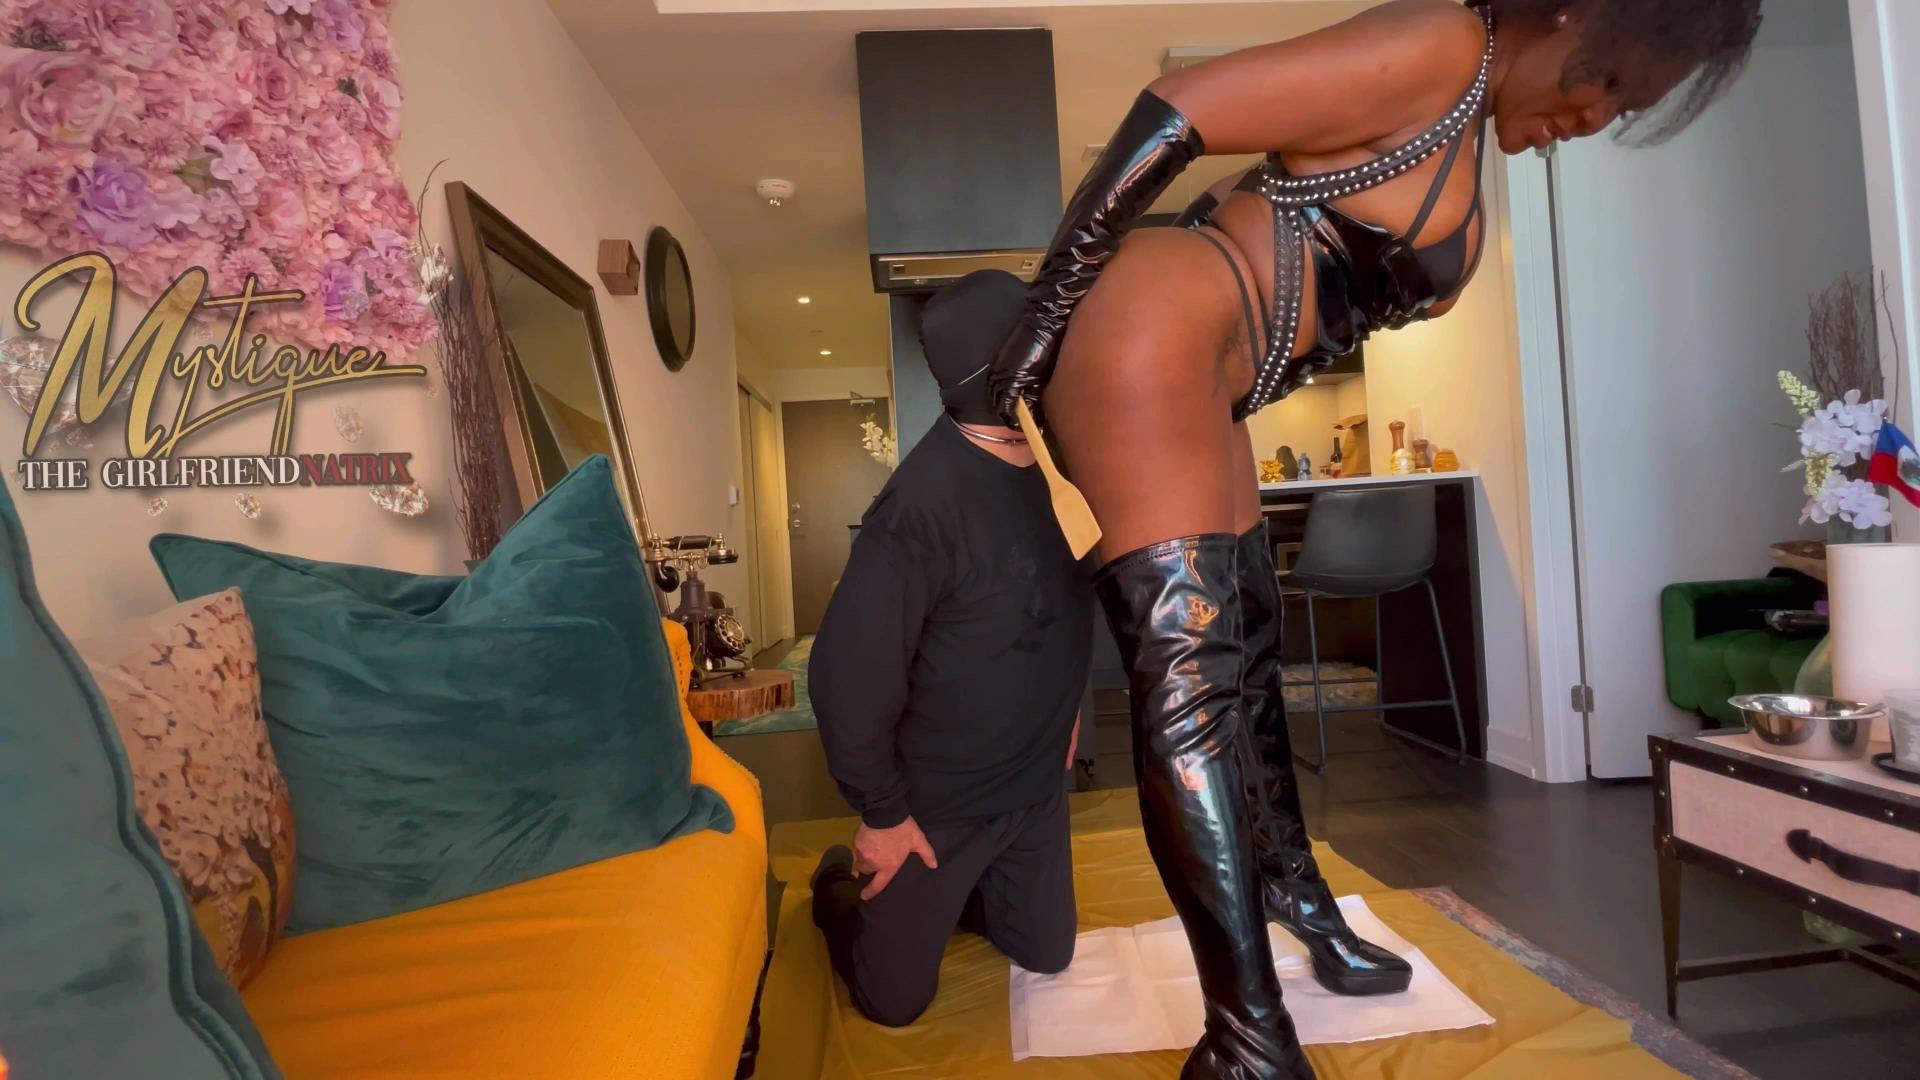 Diva Feeds The Pig starring in video MistressMystique ($54.99 ScatShop) –  Toilet Slavery